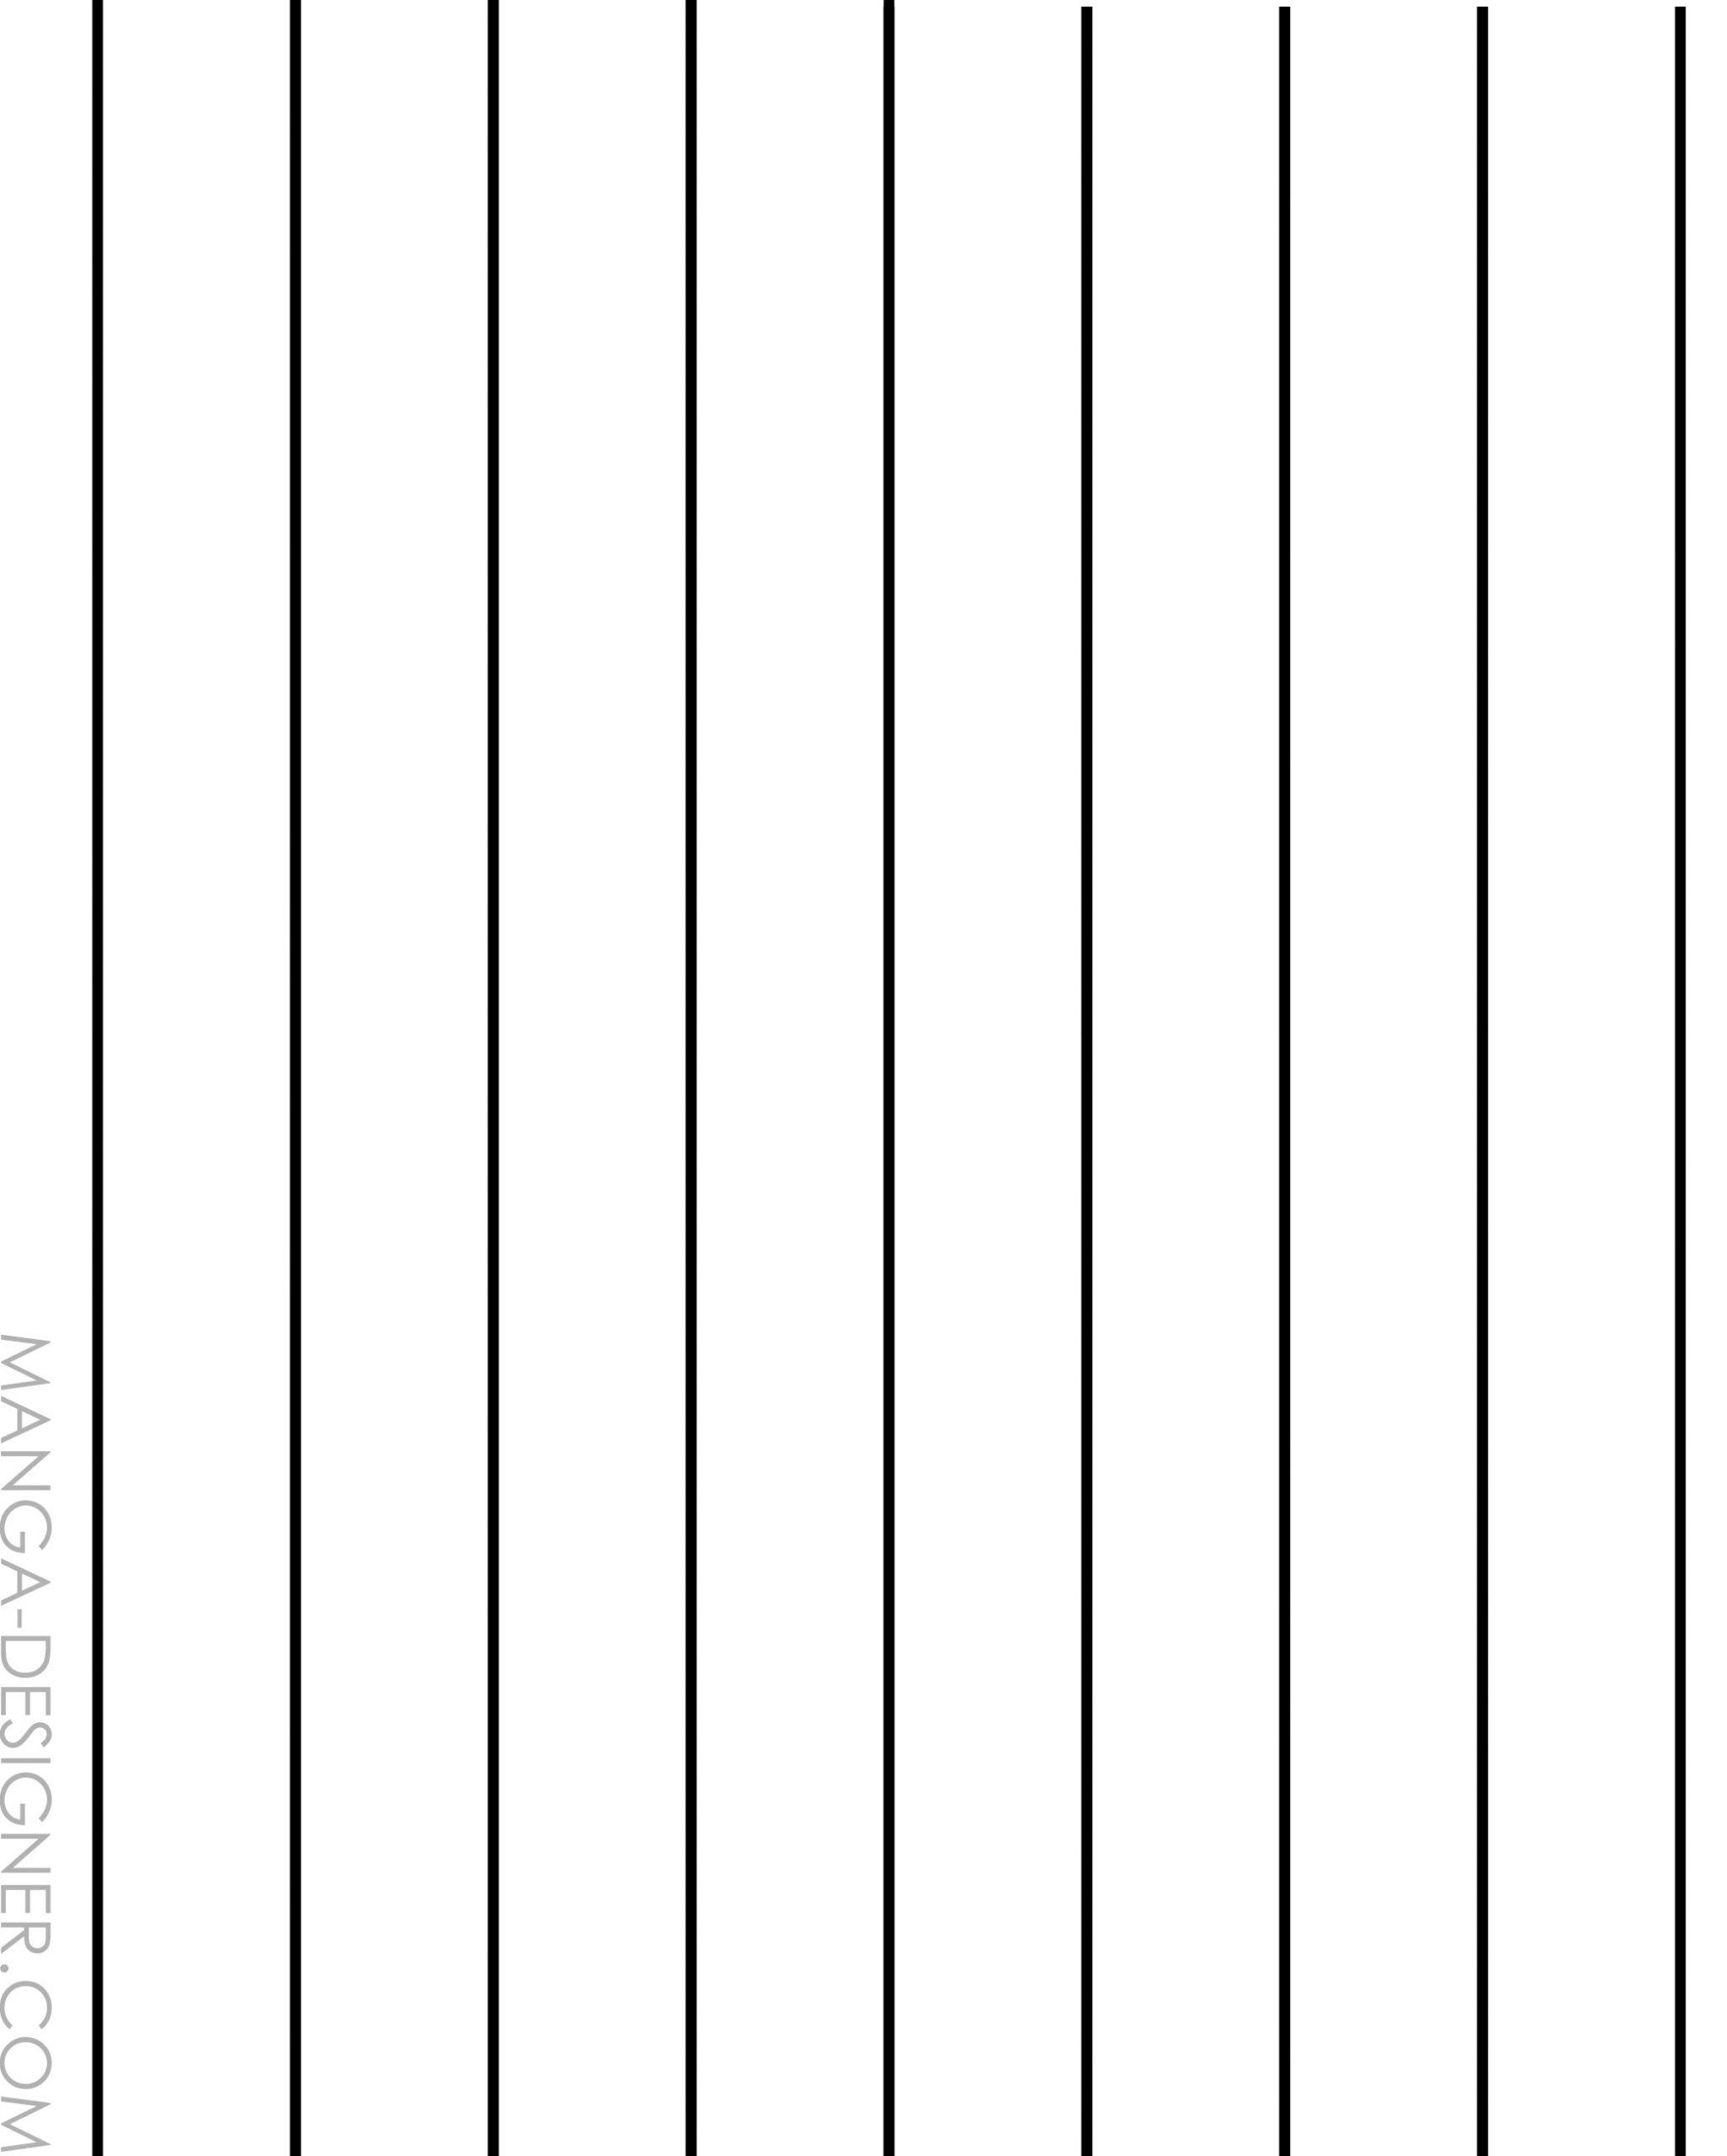 Telechargement – Manga-Designer à Feuille Lignée A Imprimer